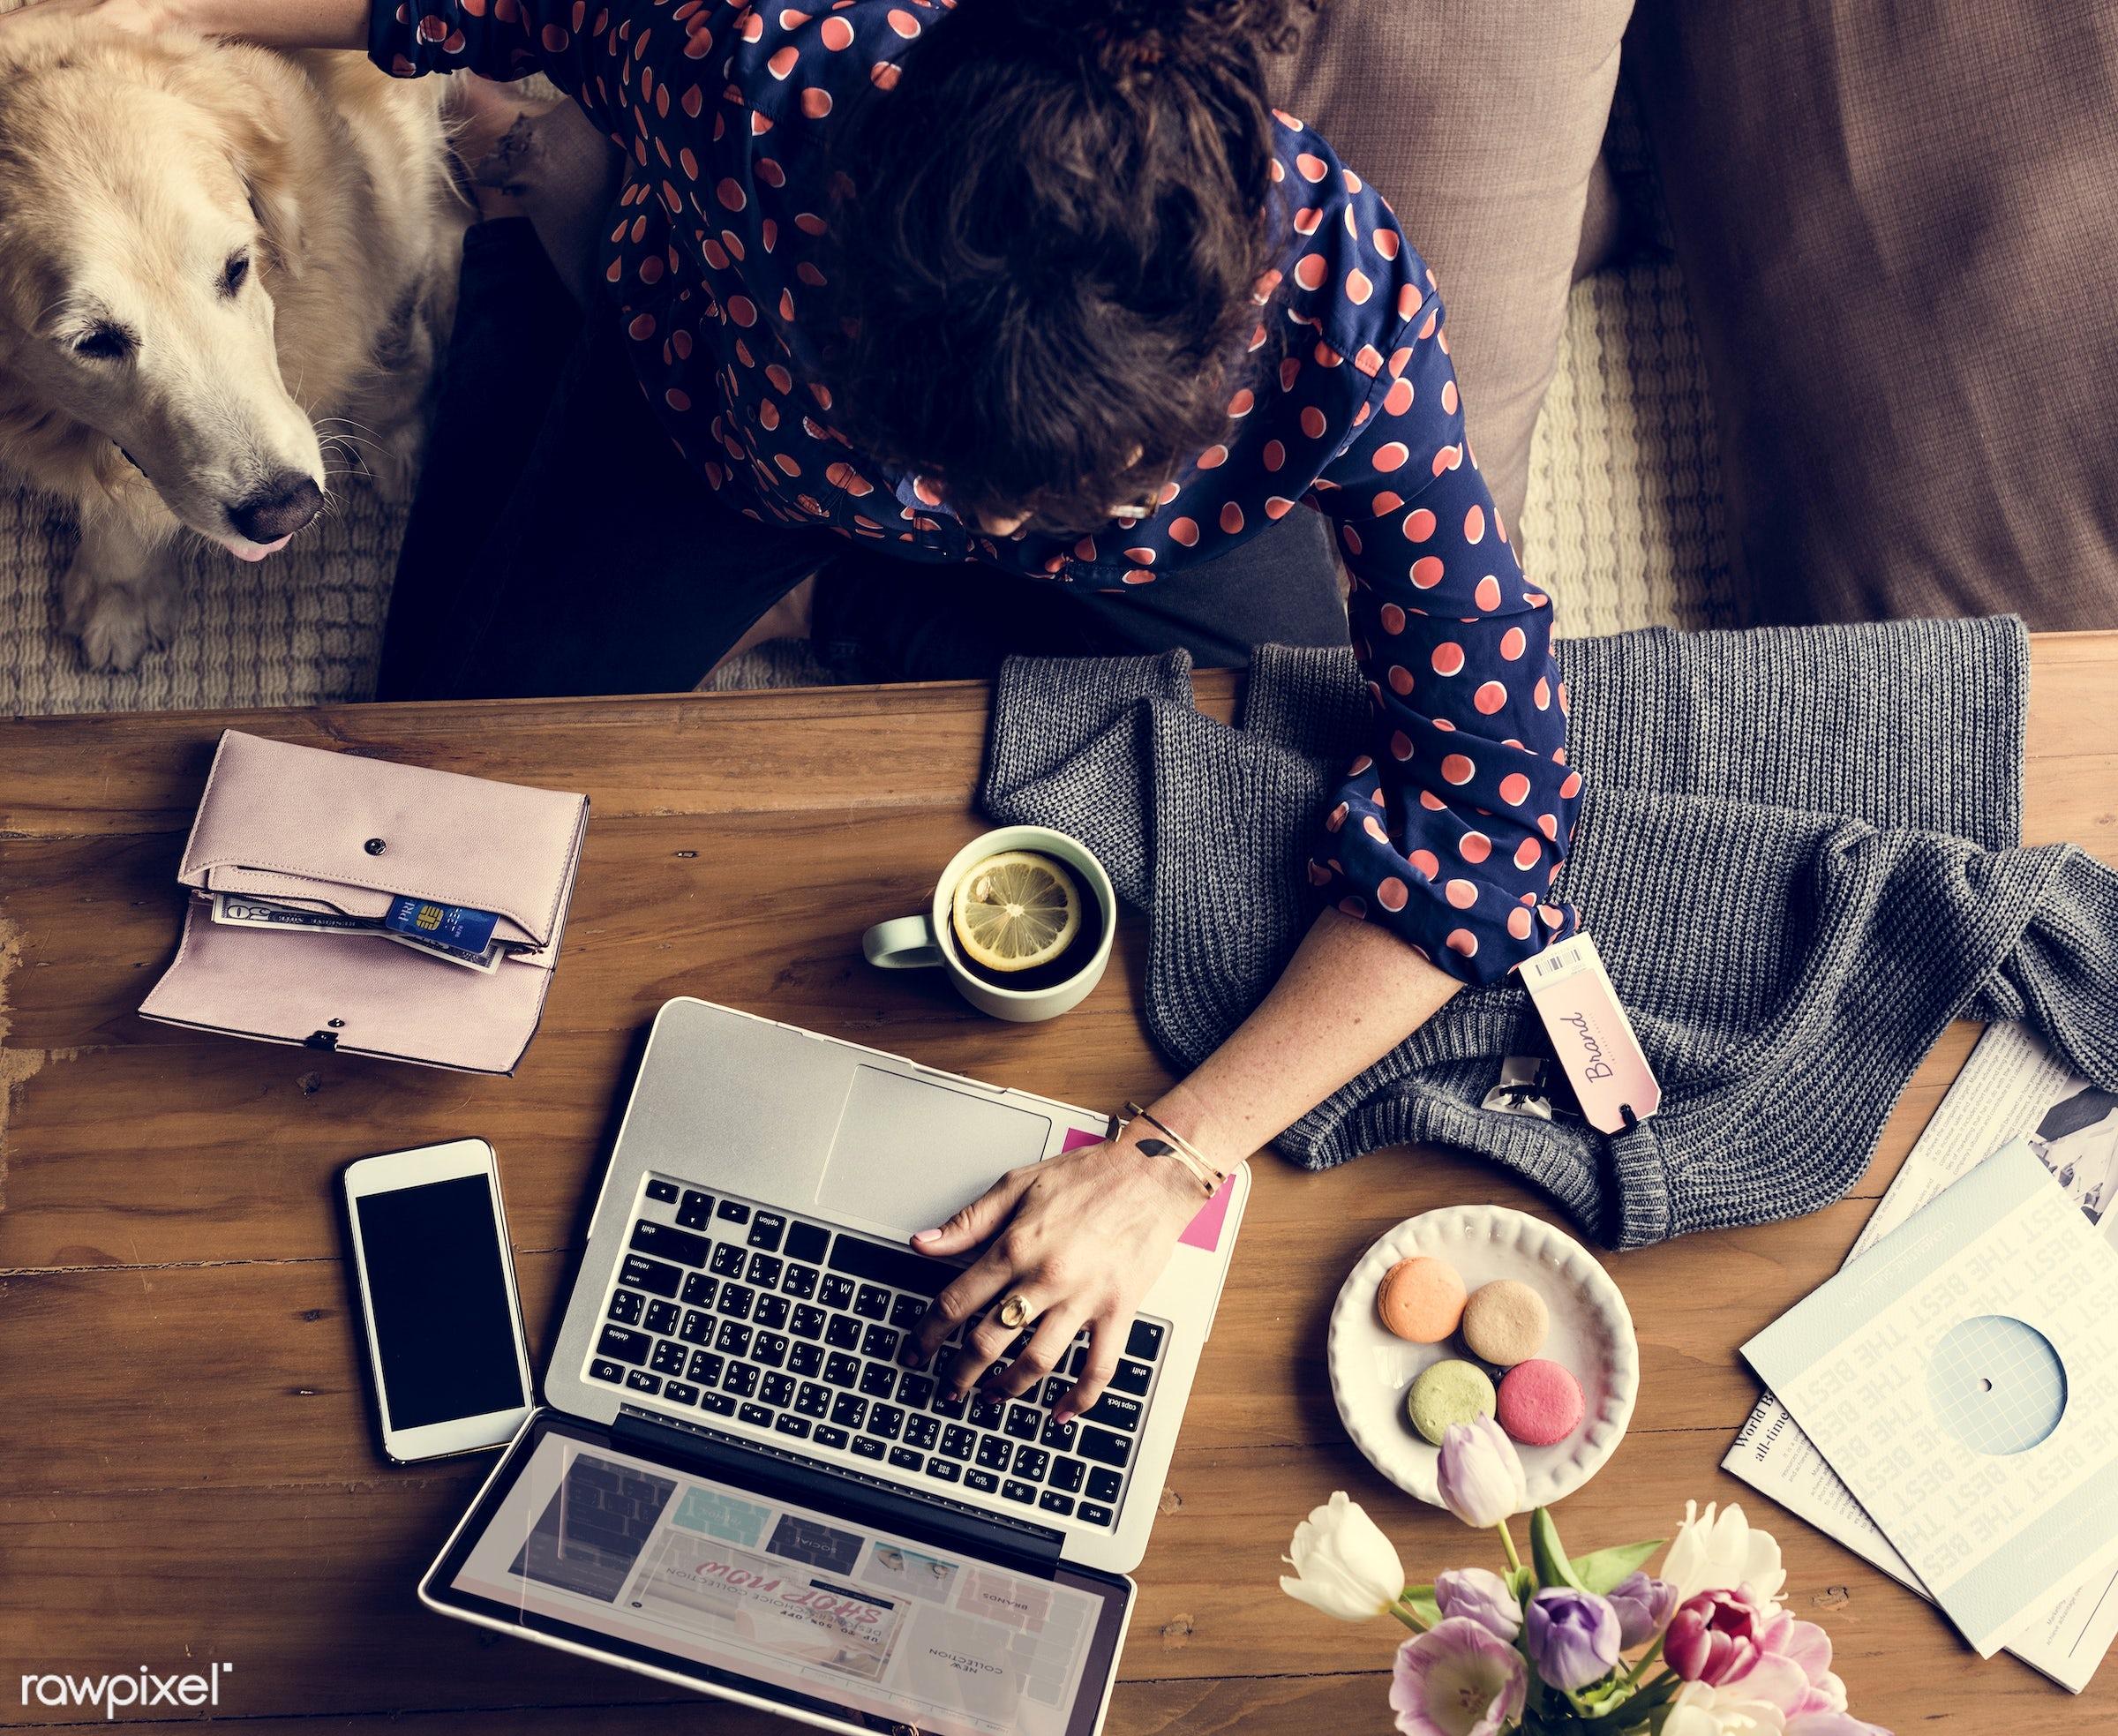 shop, person, phone, using, online shop, relax, desktop, show, people, search, cellphone, woman, laptop, surf, flowers,...